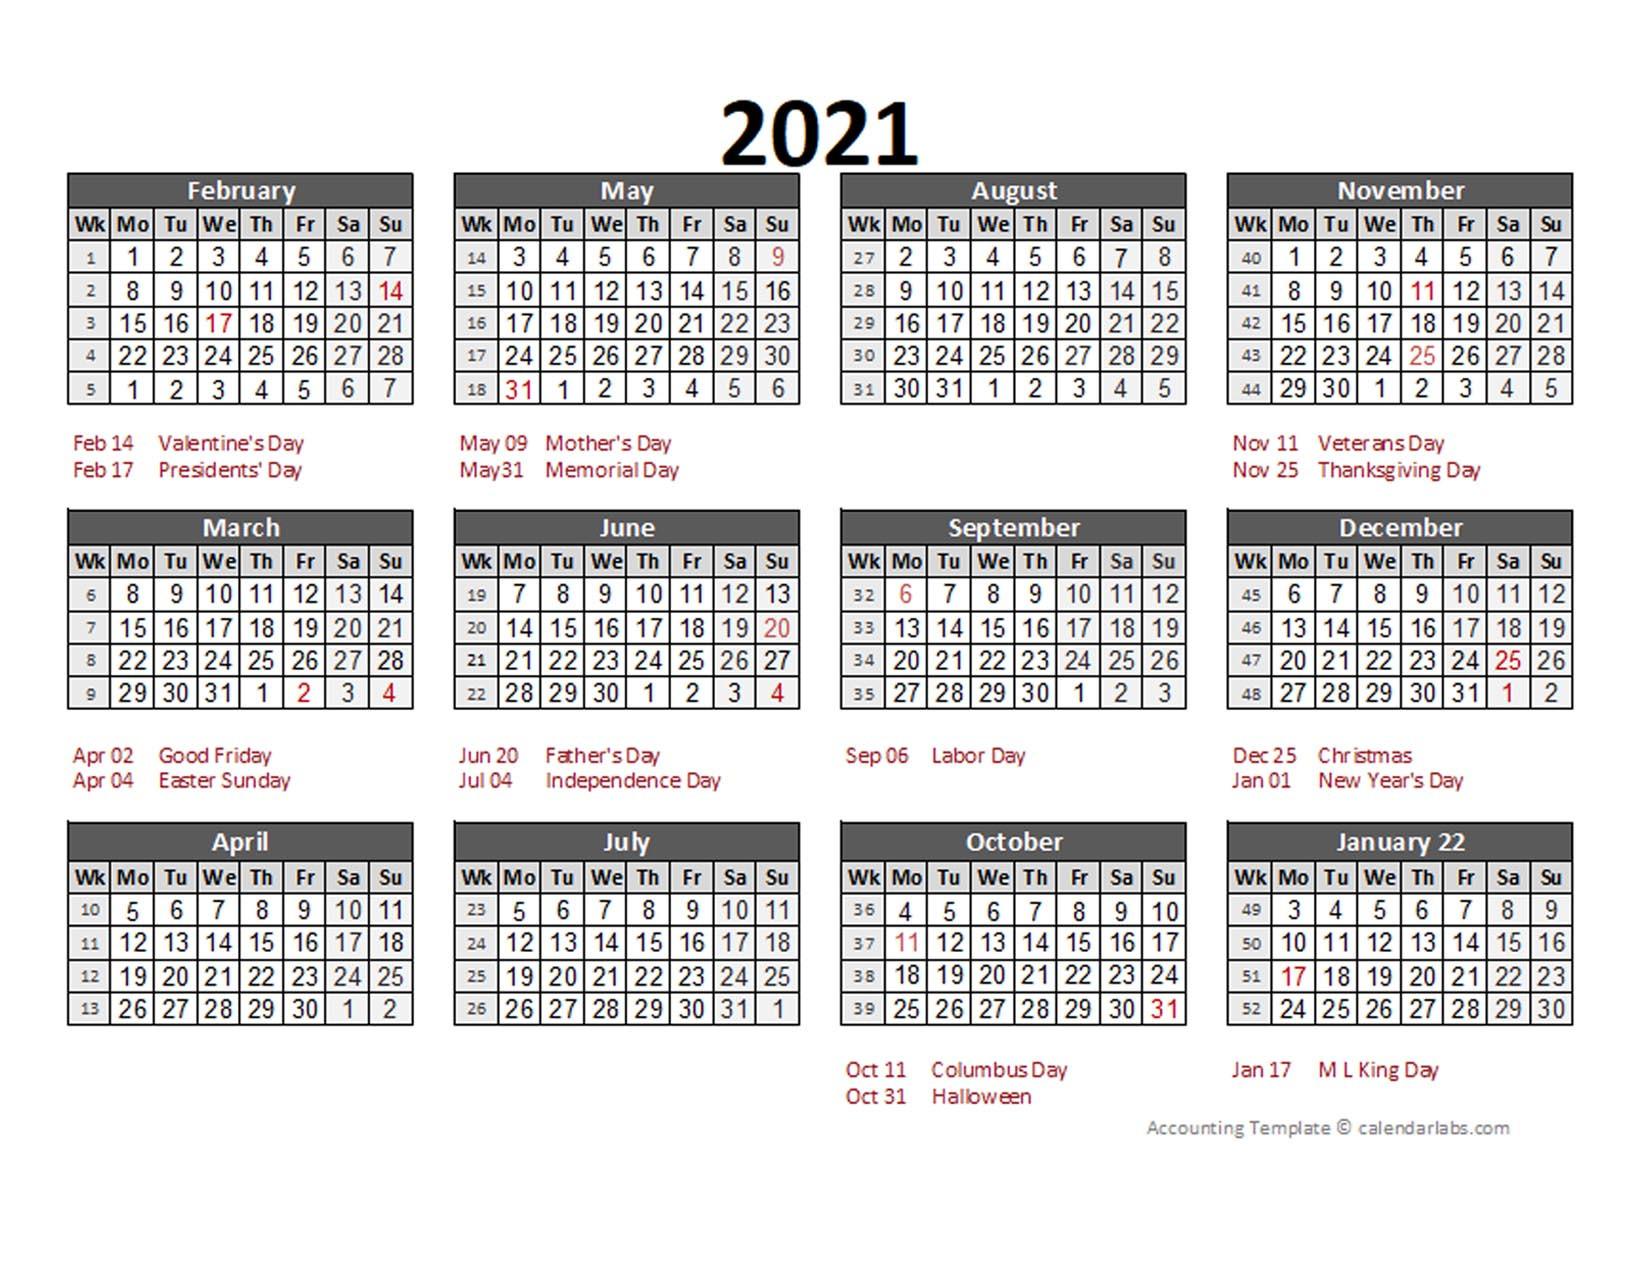 2021 Accounting Calendar 5-4-4 - Free Printable Templates  2021 Fiscal Year Julian Calendar